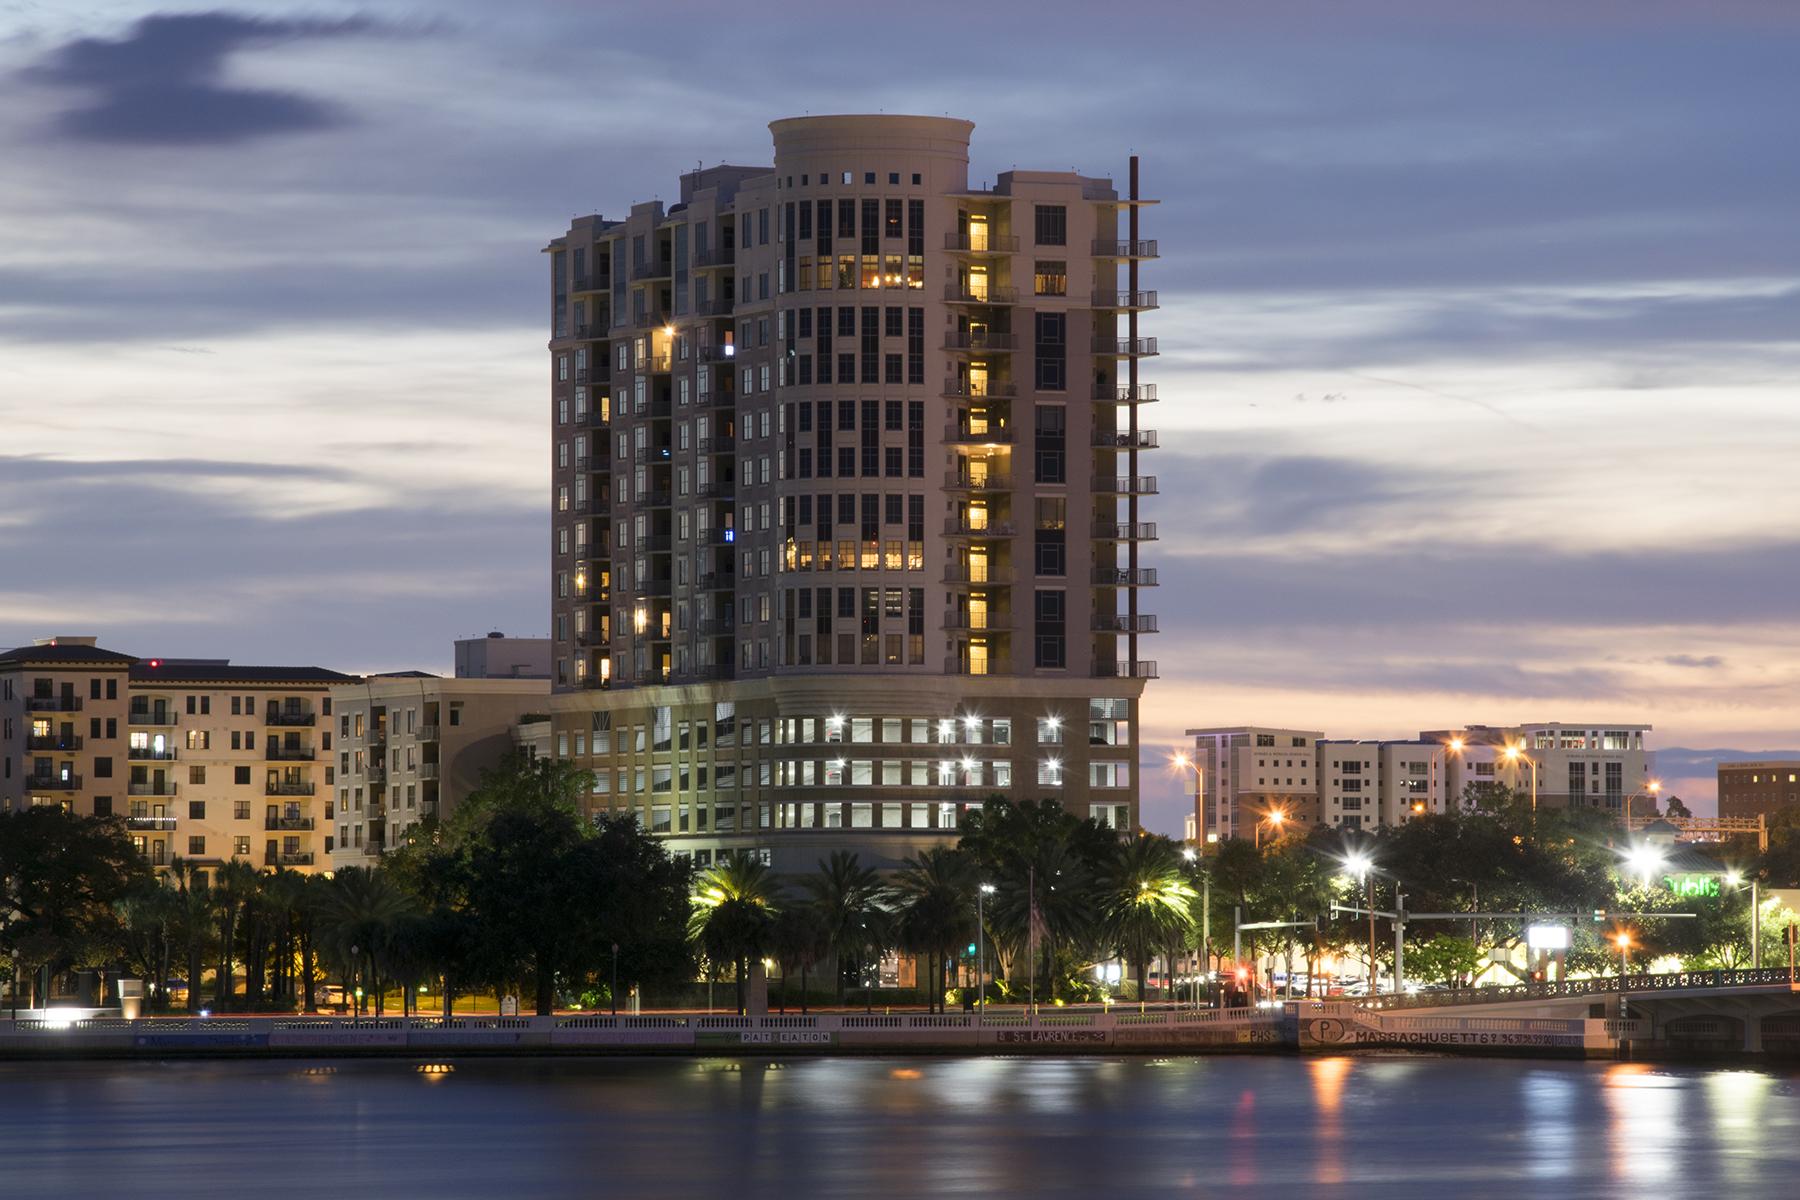 Condominium for Sale at SOUTH TAMPA 275 Bayshore Blvd 401 Tampa, Florida, 33606 United States